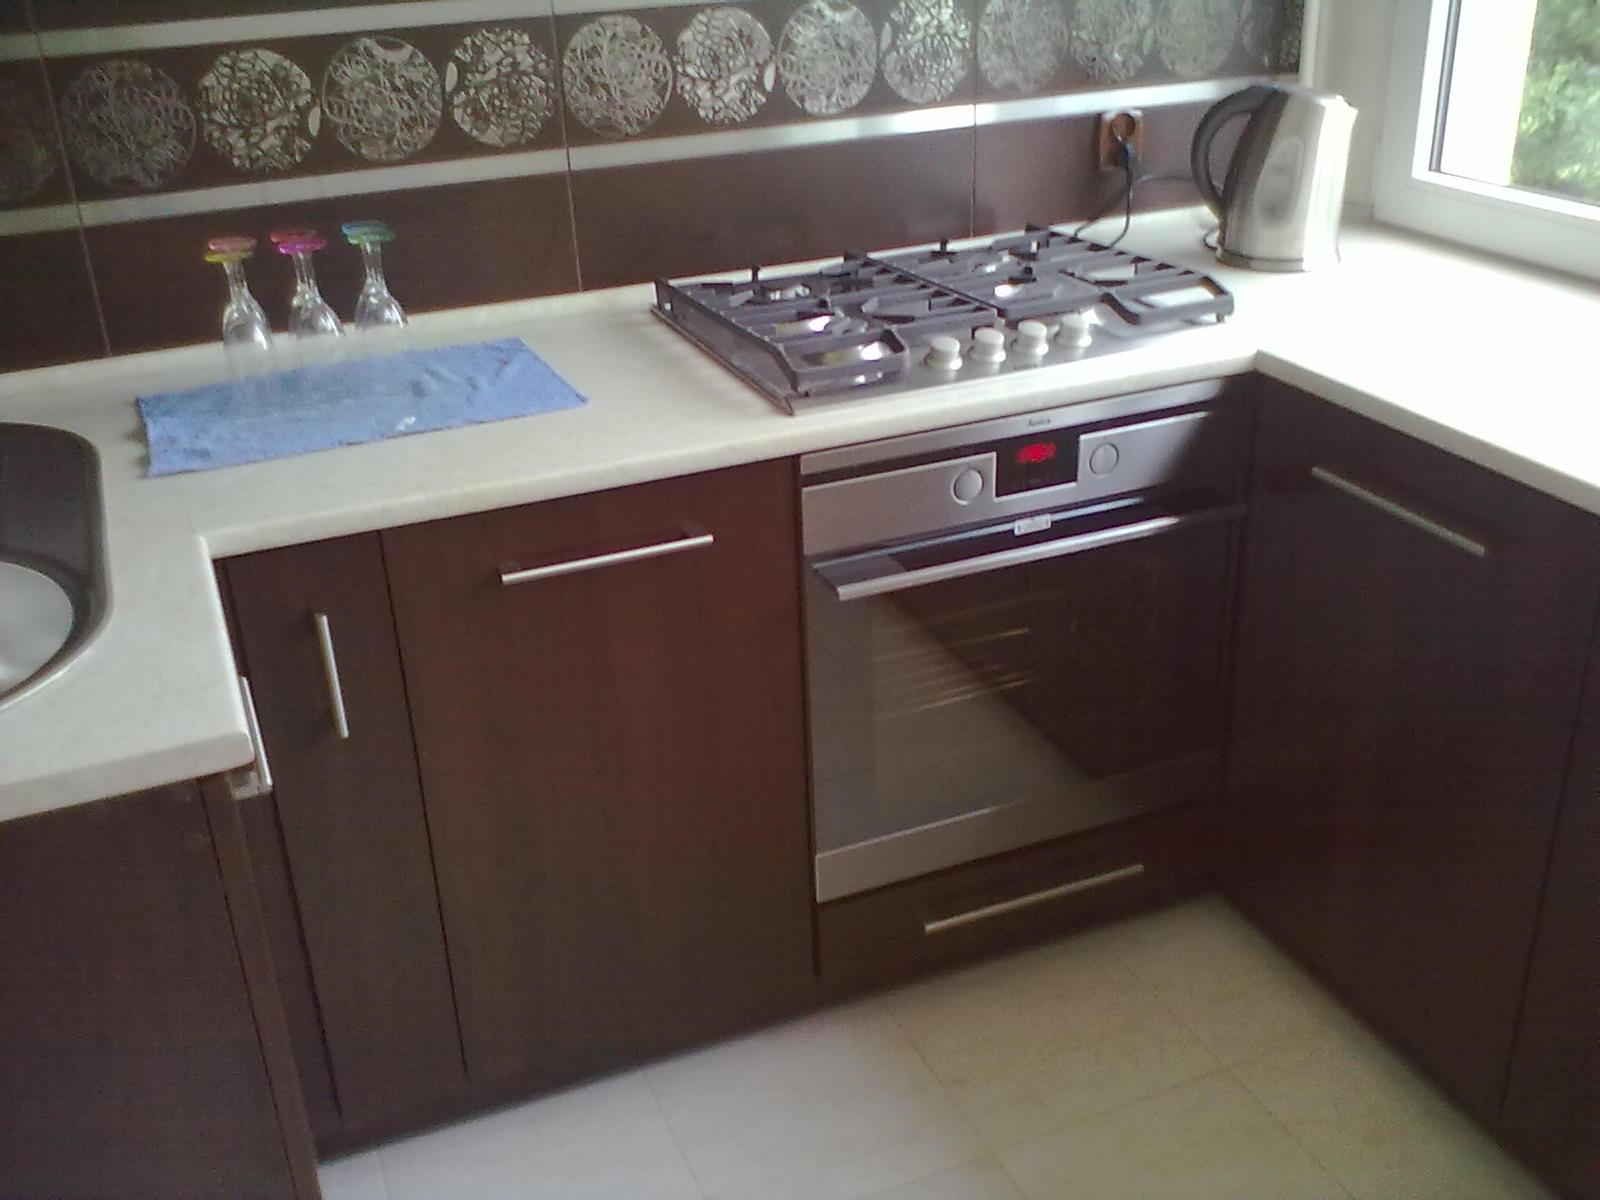 Mała kuchnia w bloku -> Mala Kuchnia Ze Skosem